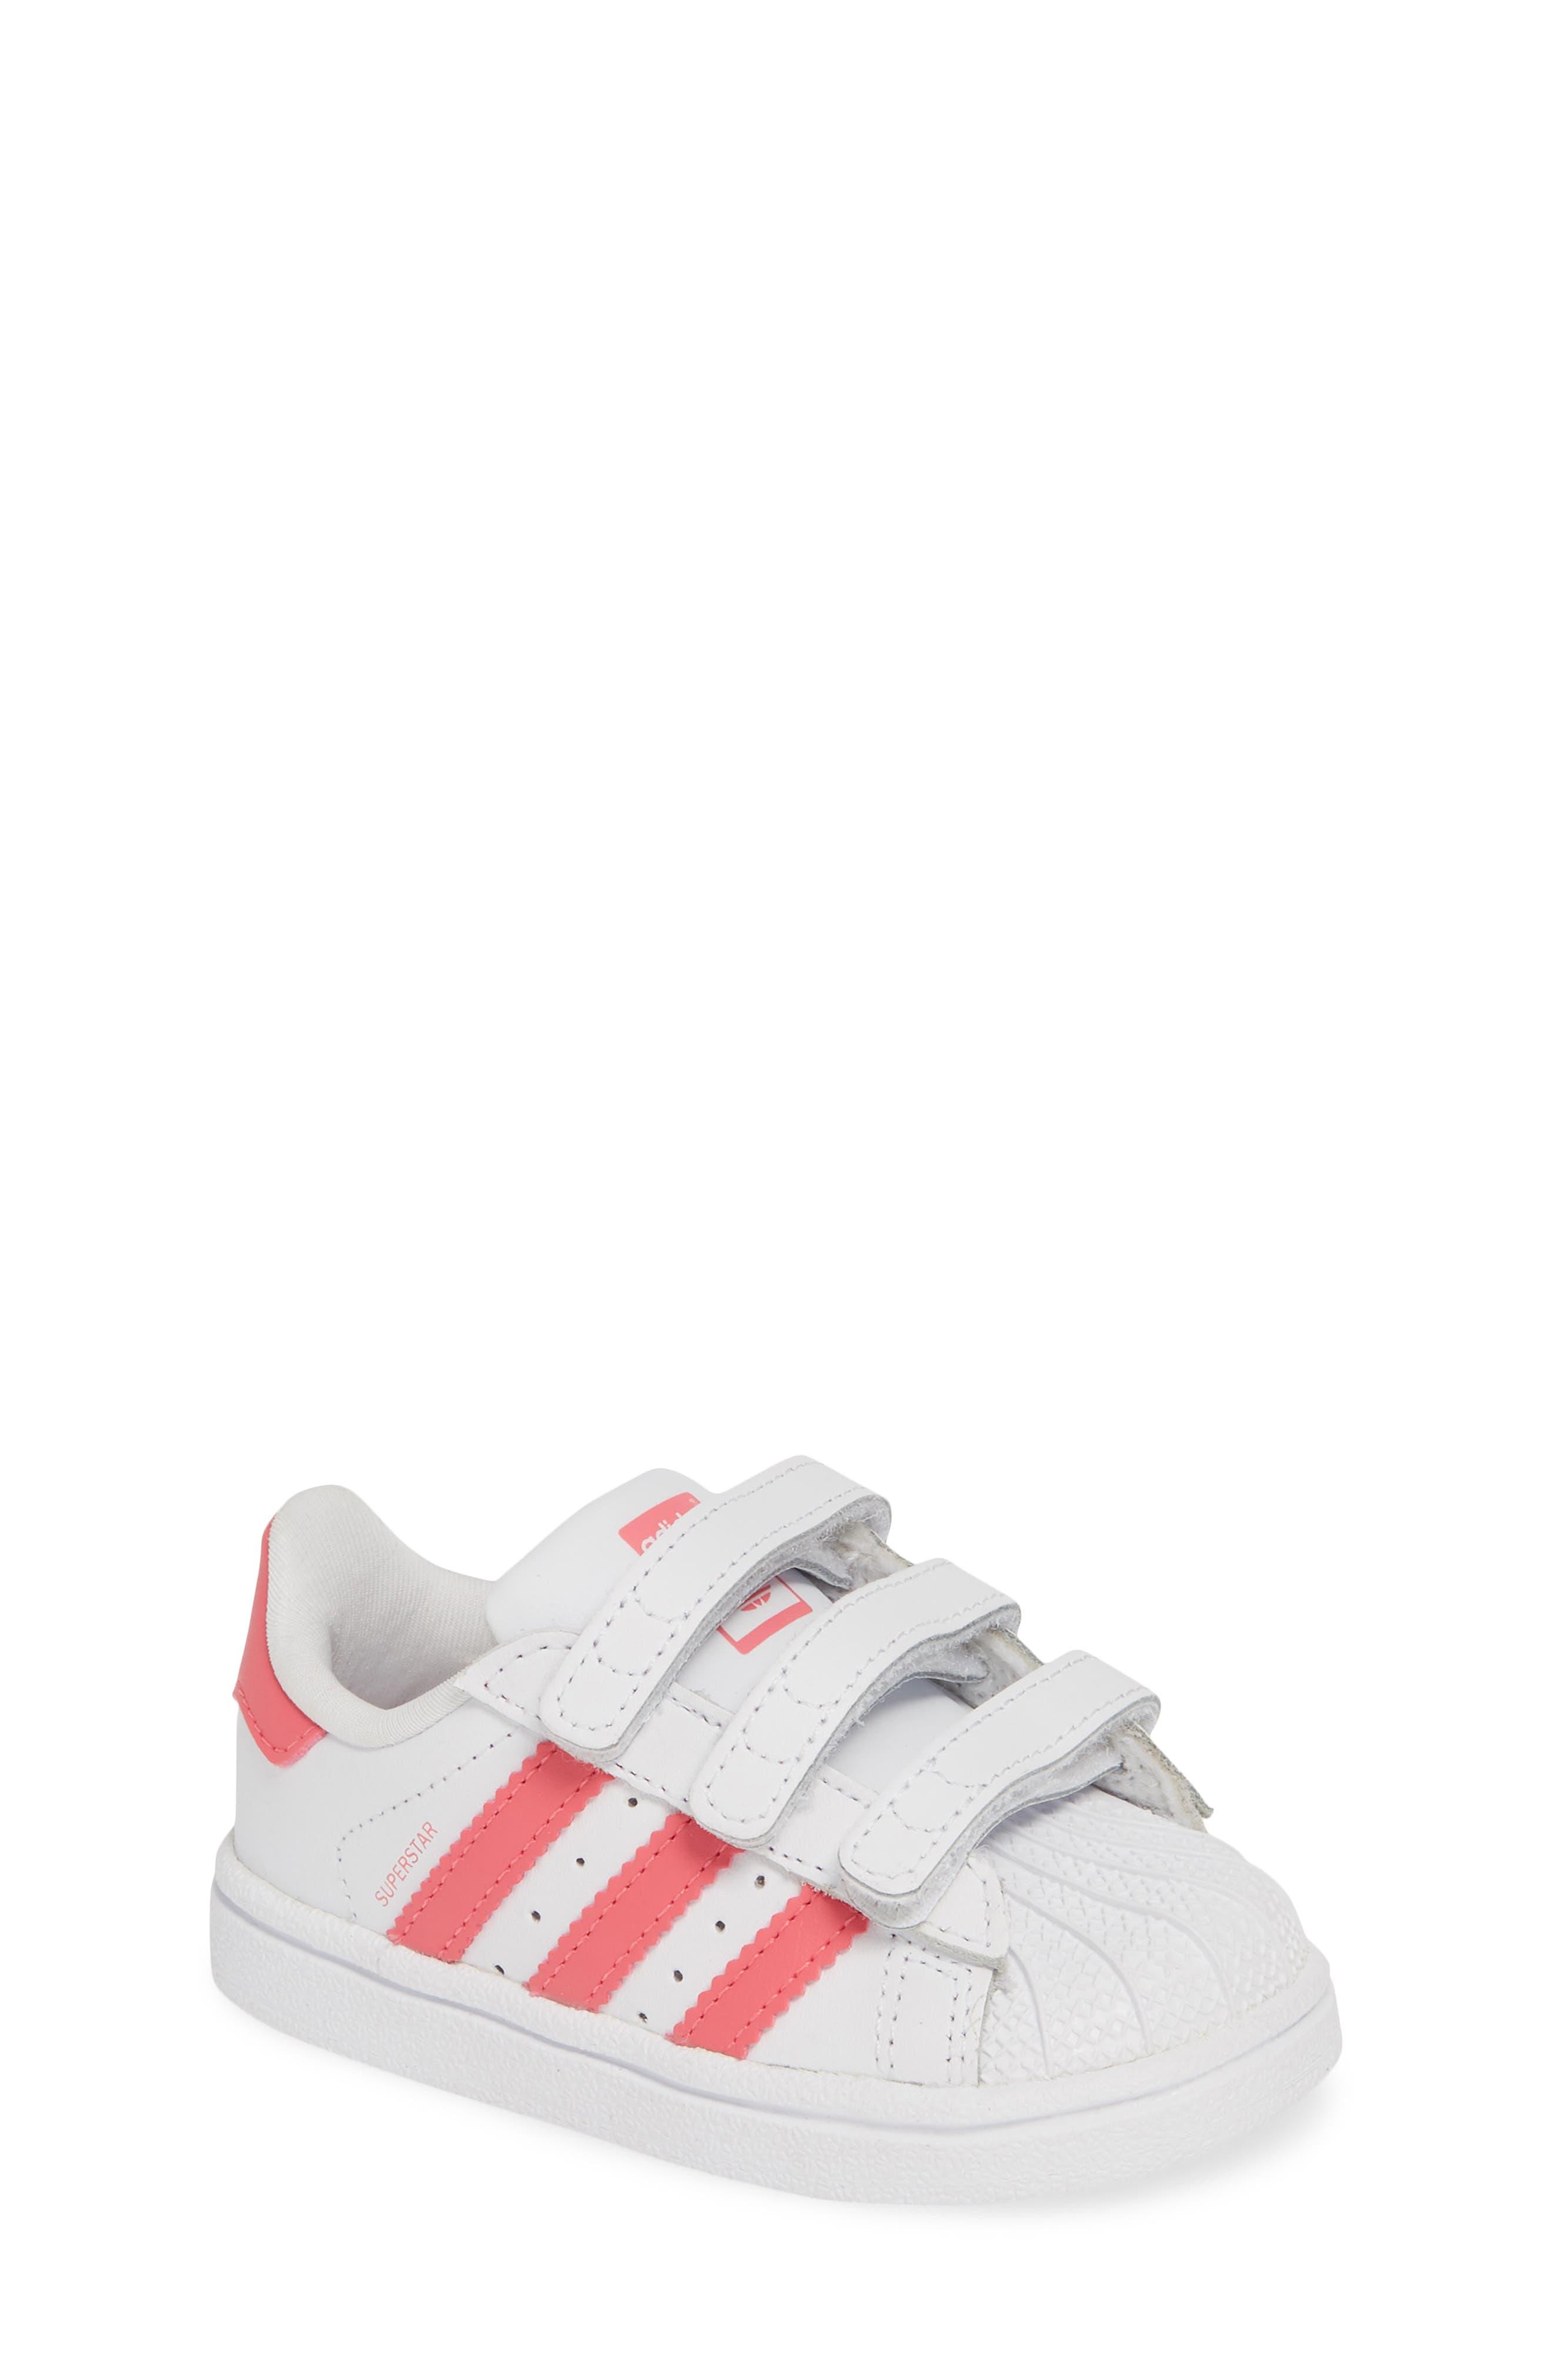 8a2fc22d2 Girls  Adidas Shoes